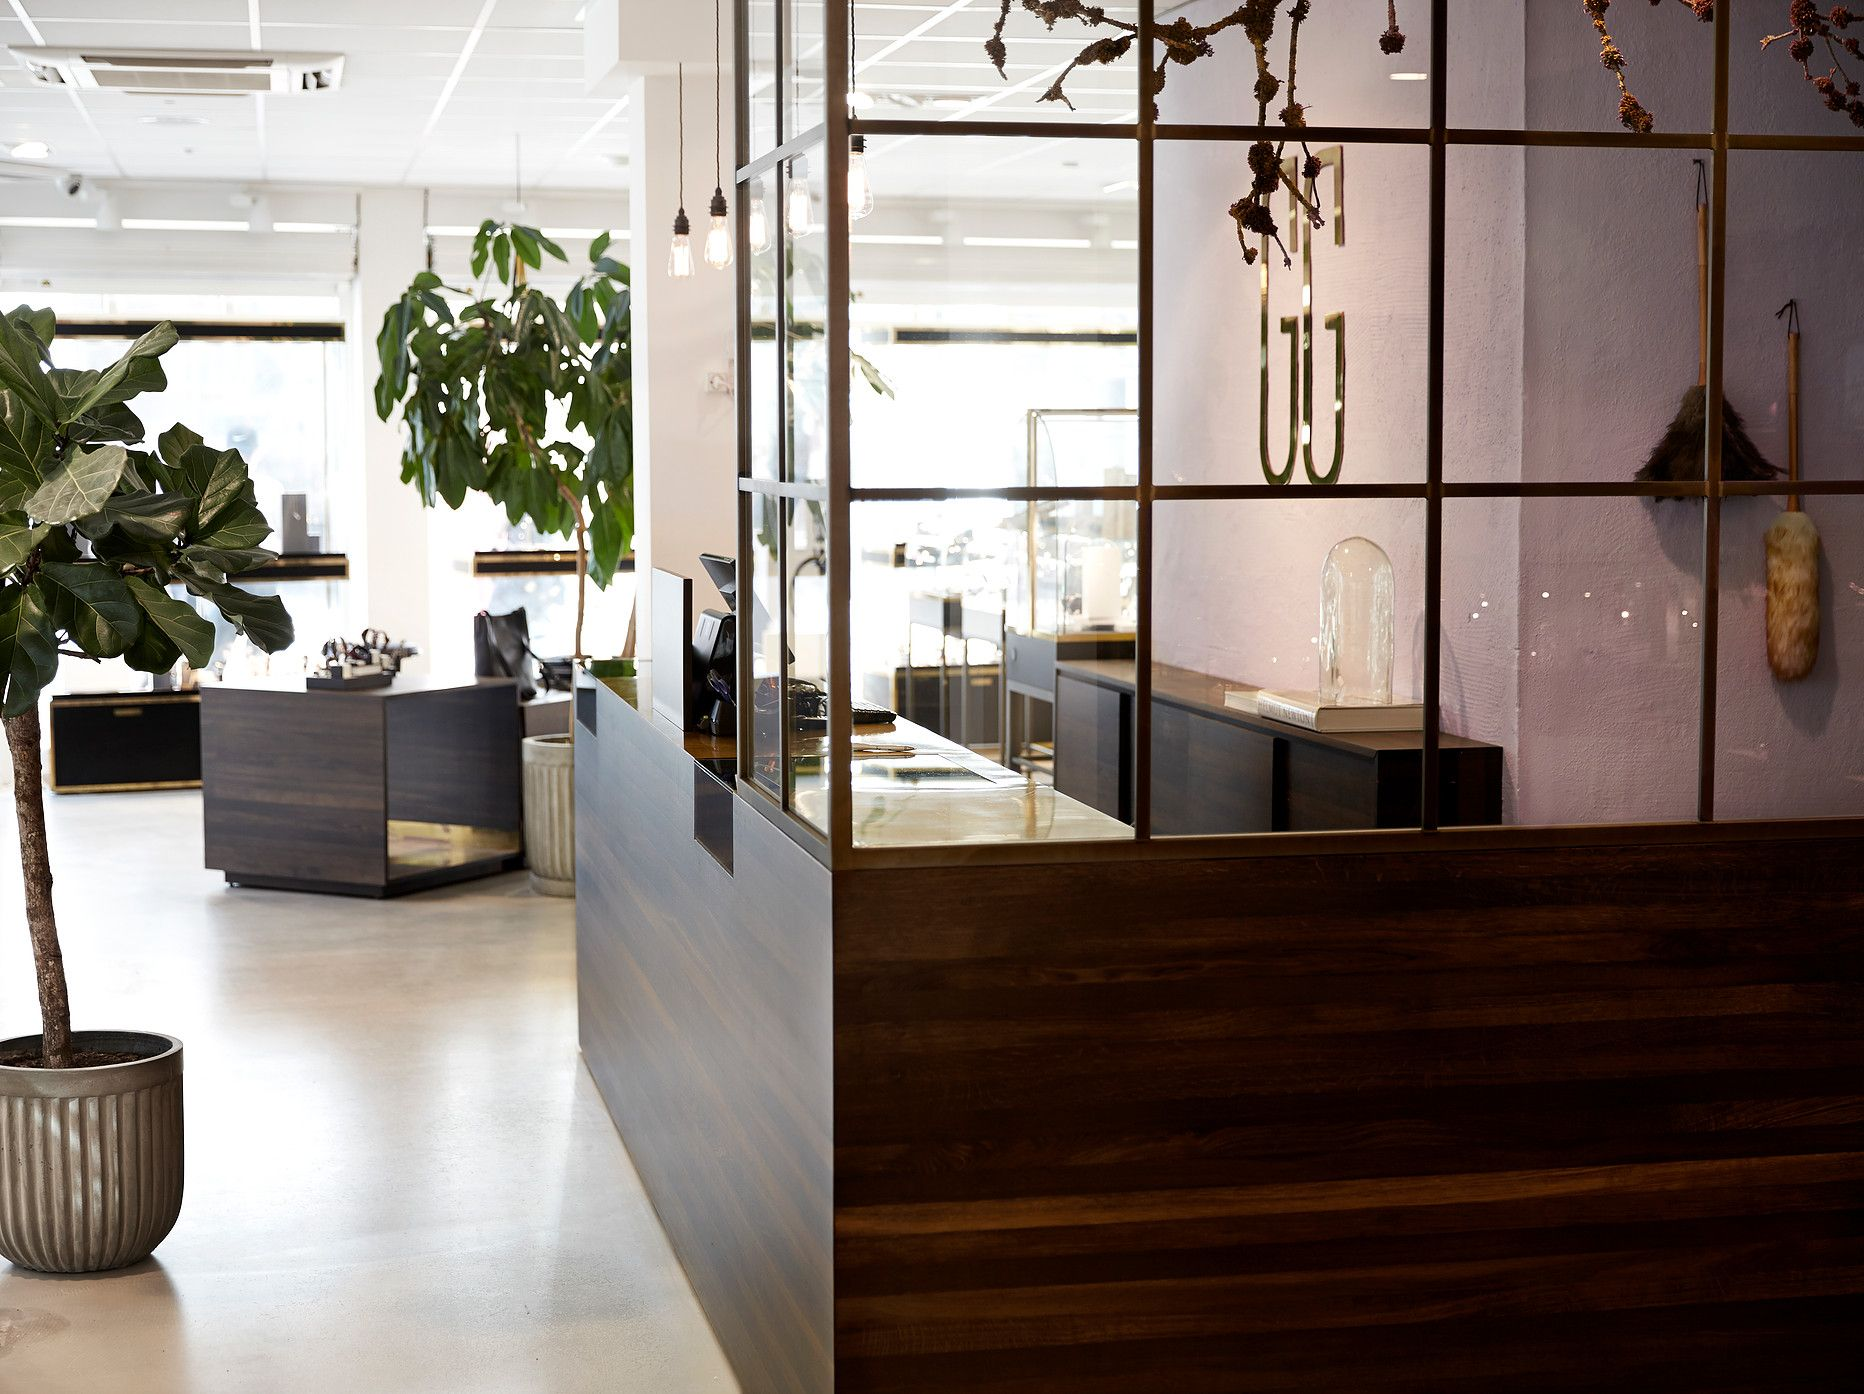 Interior design, retail, Jewelry store. Furniture design, smoked oak, glass and brass. By Anni gram.